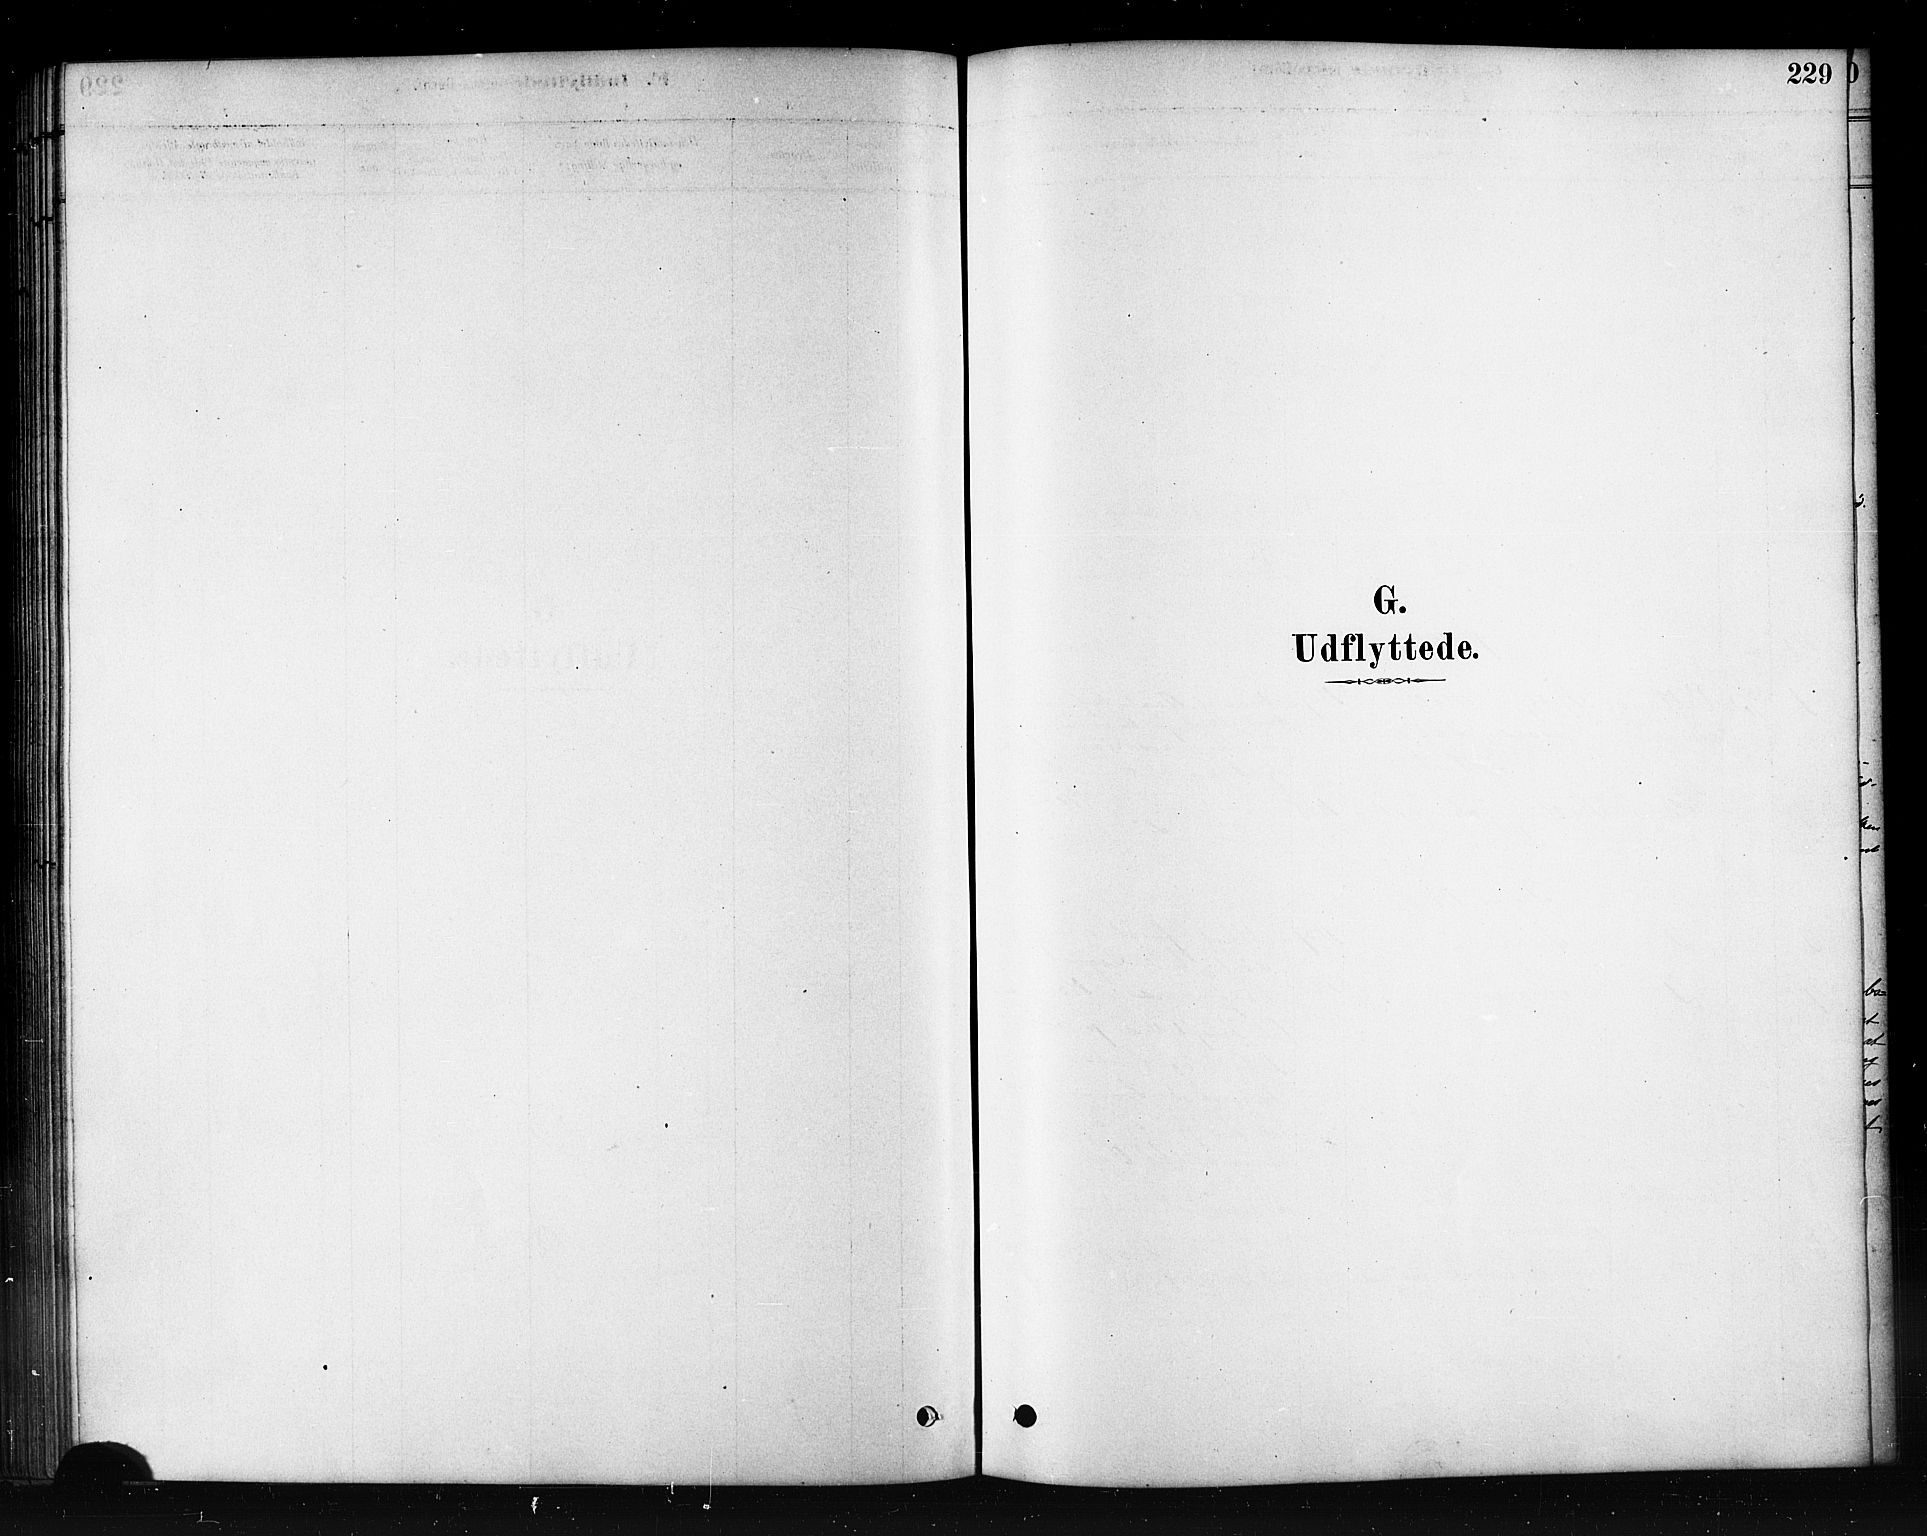 SATØ, Kautokeino sokneprestembete, H/Hb/L0002.klokk: Klokkerbok nr. 2, 1877-1896, s. 229